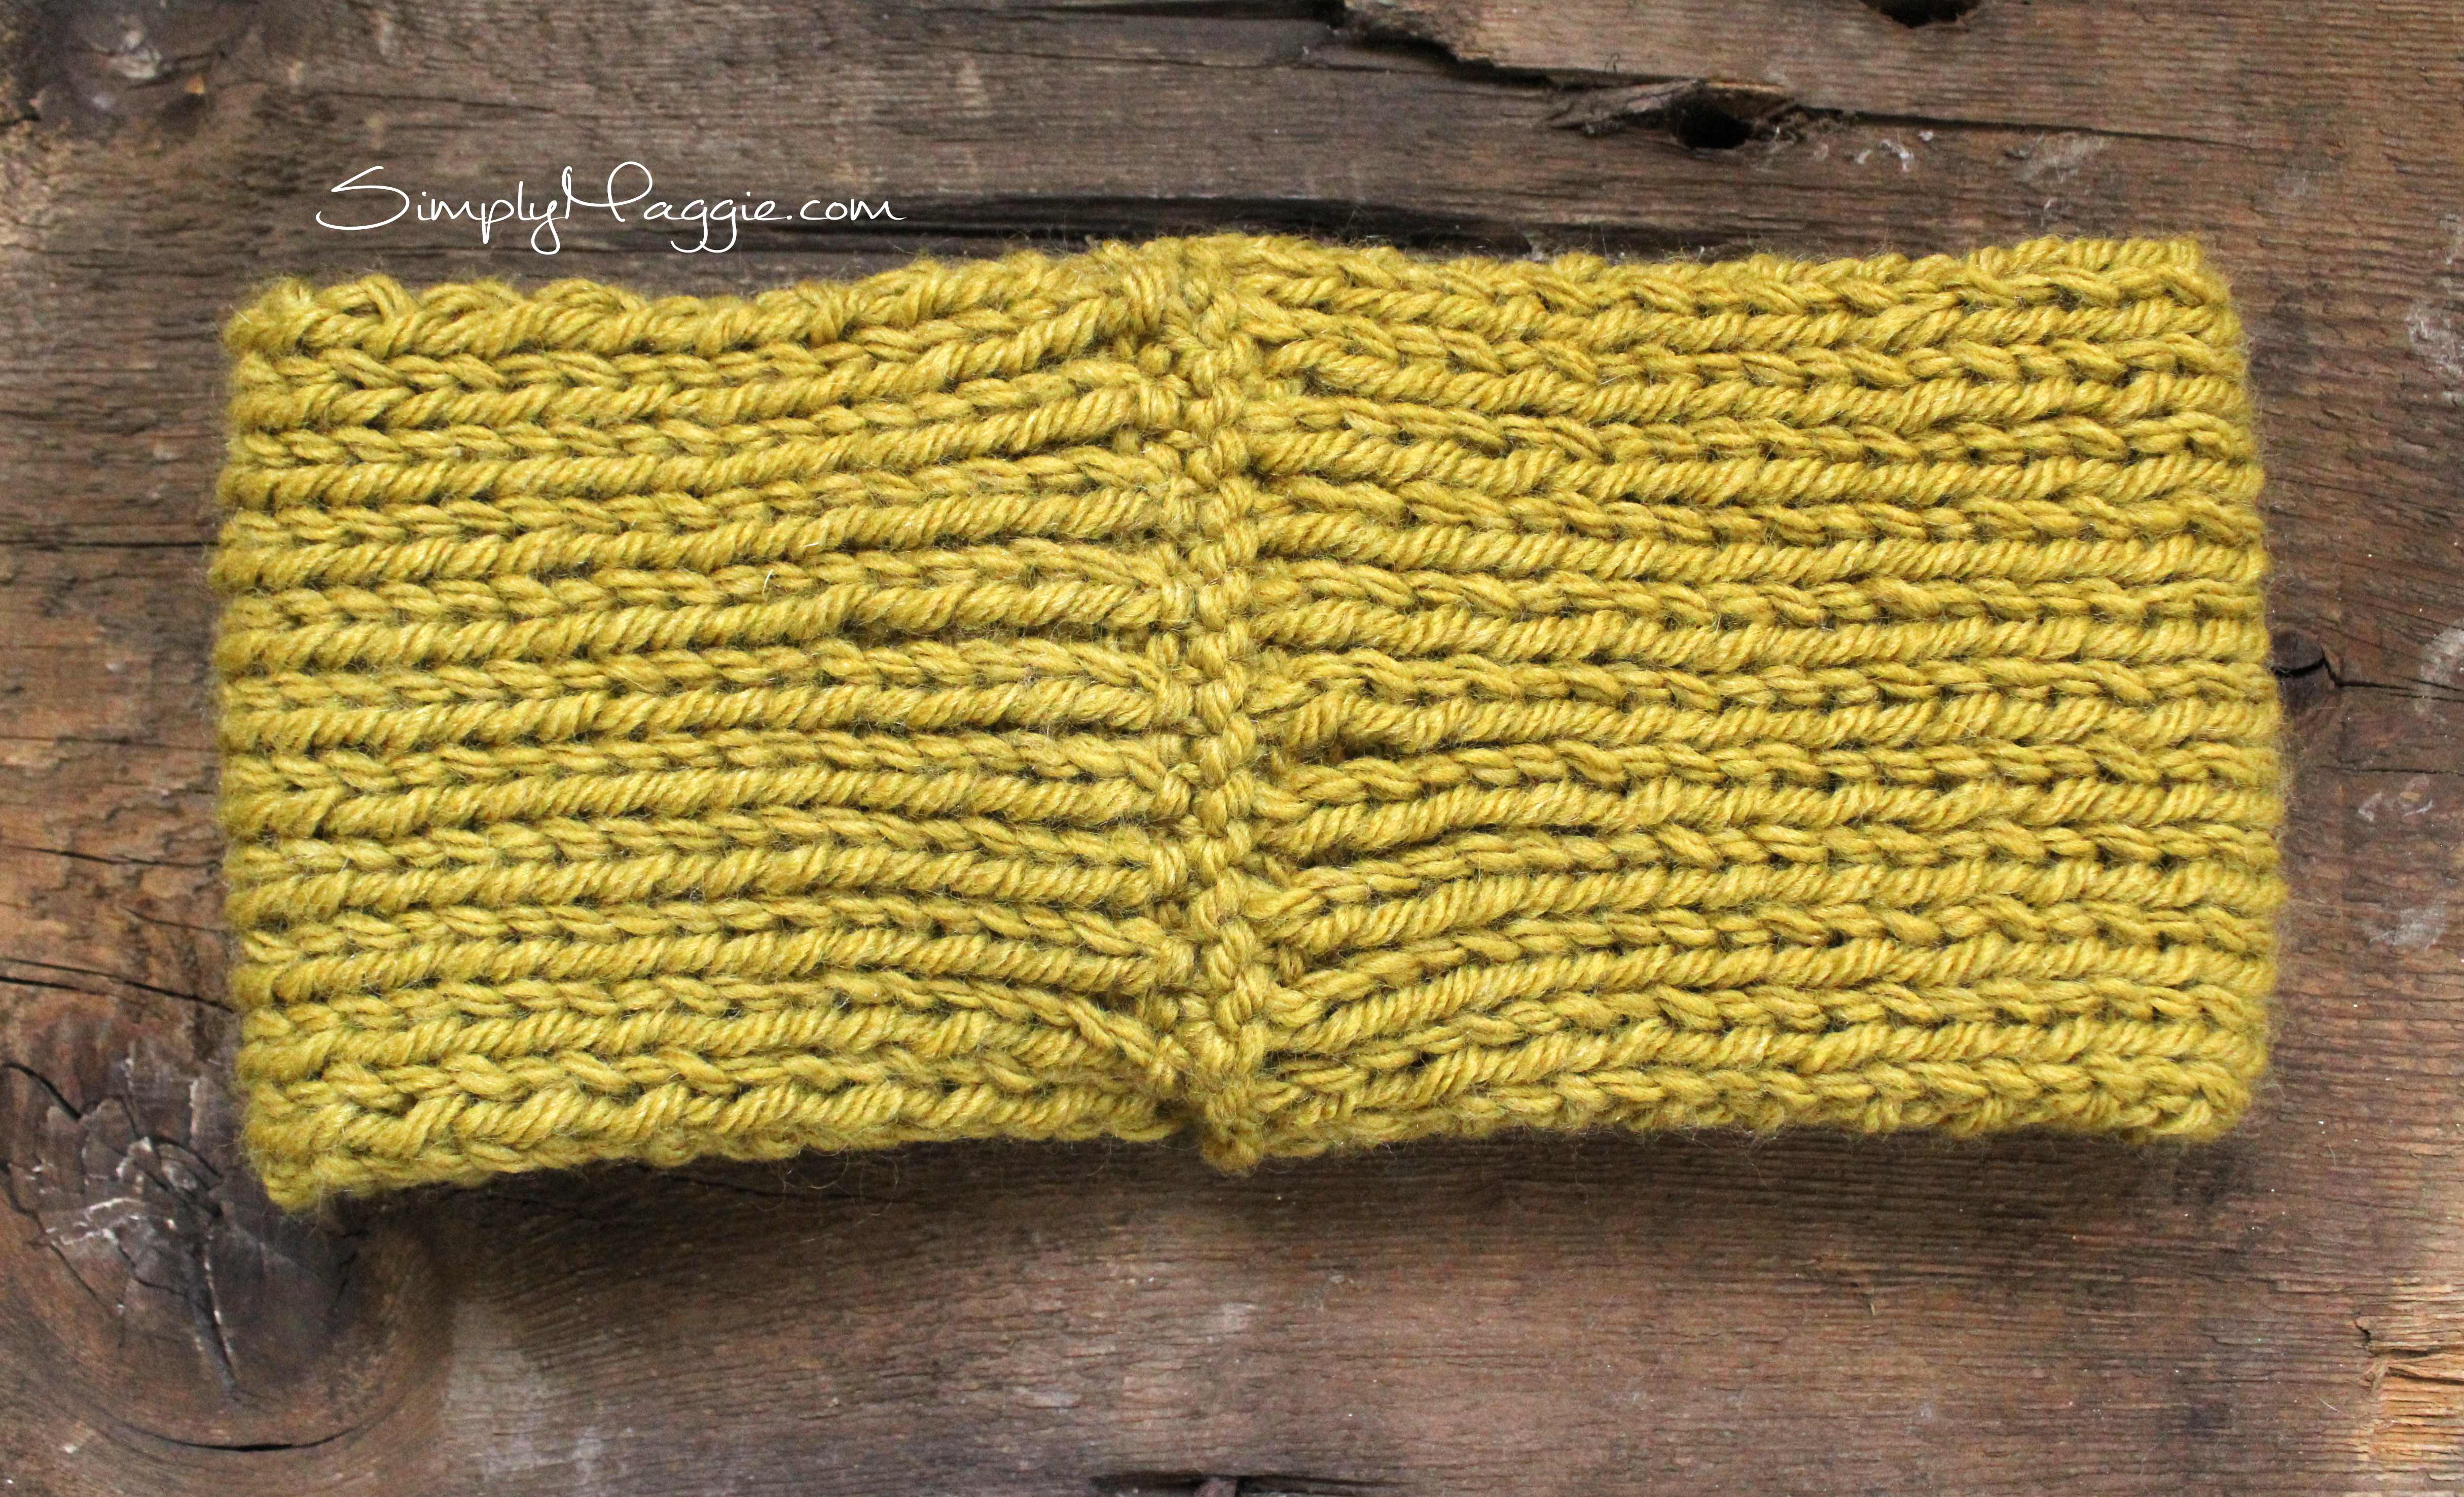 Turban Headband Knitting Pattern : Turban Style Knit Headband SimplyMaggie.com